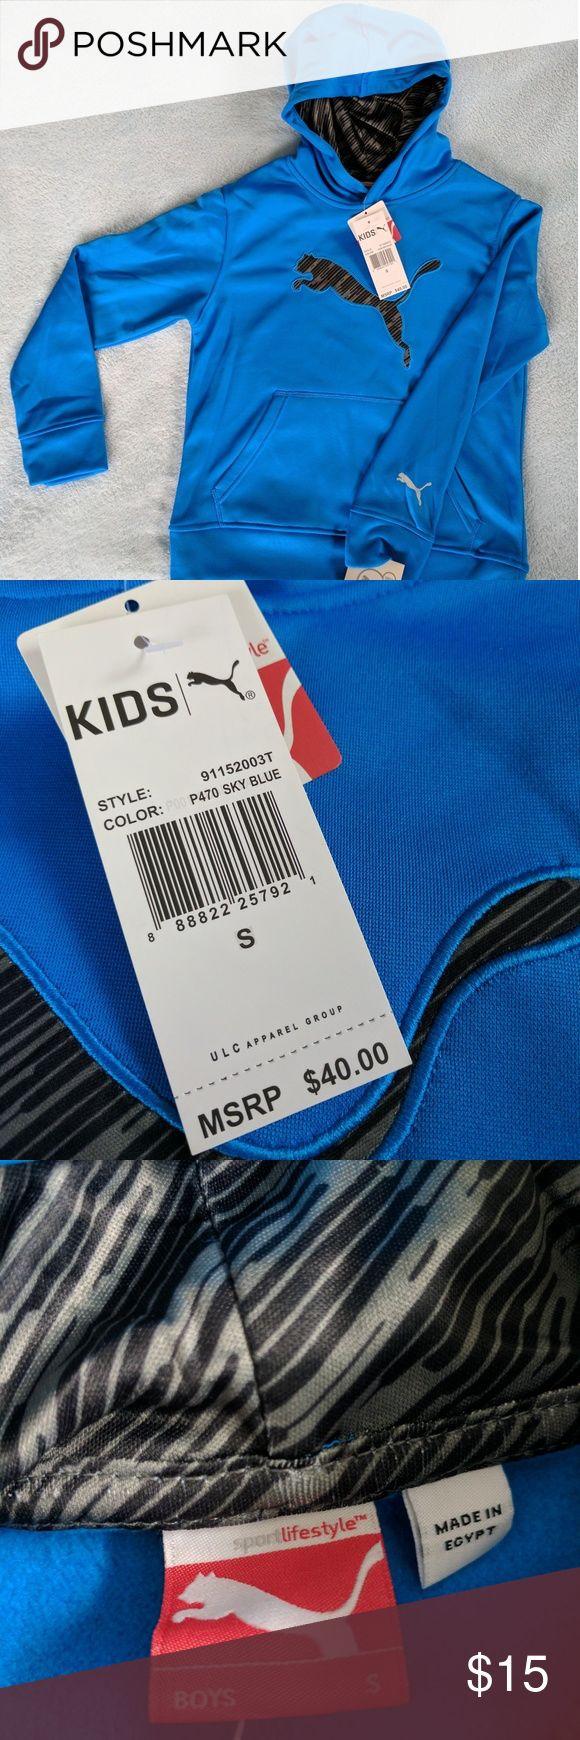 Blue Puma Hoodie Boy Size S NWT Boys' size S hooded sweatshirt by Puma. This item is brand new with tags. Puma Shirts & Tops Sweatshirts & Hoodies